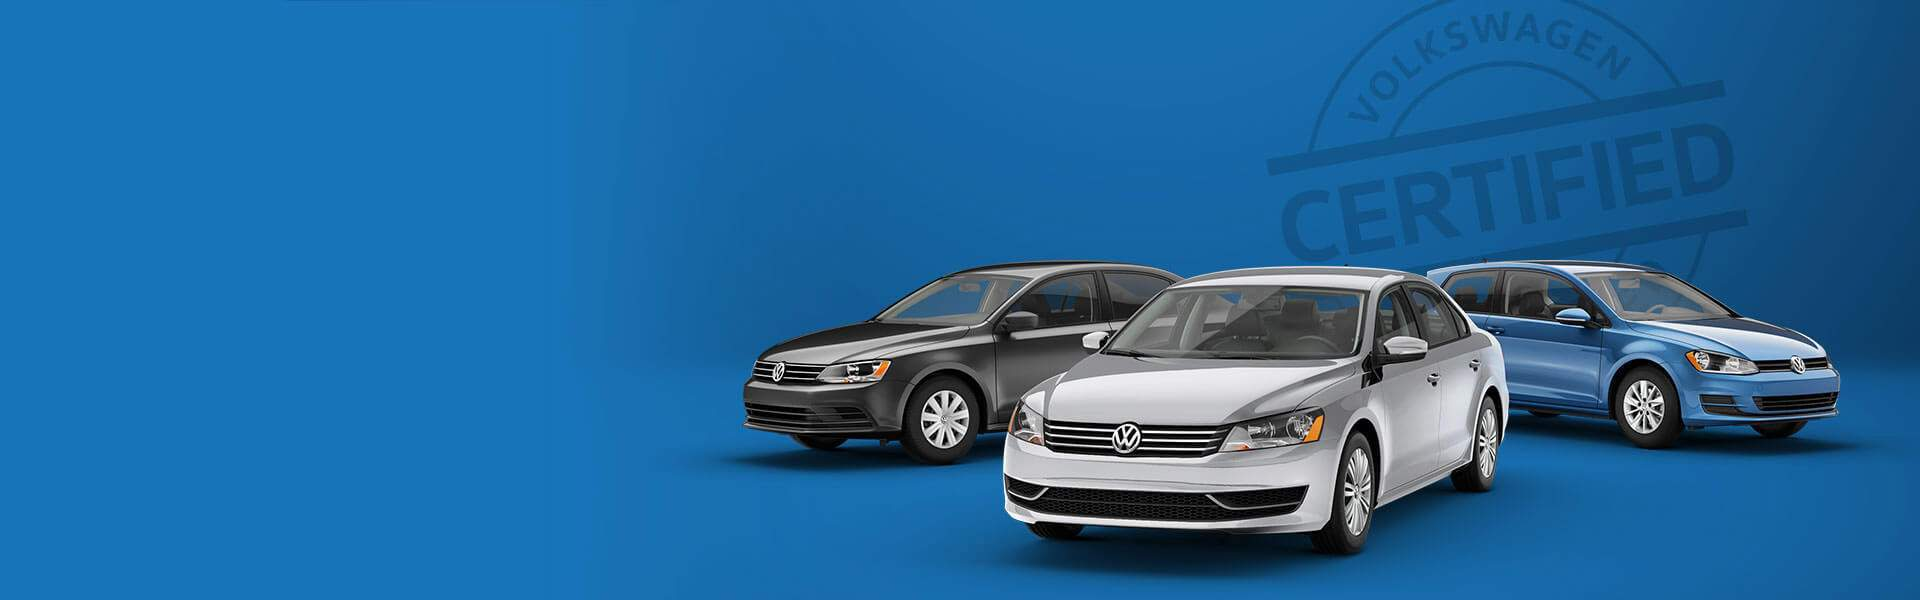 Volkswagen Certified Pre-Owned in Pompton Plains, NJ